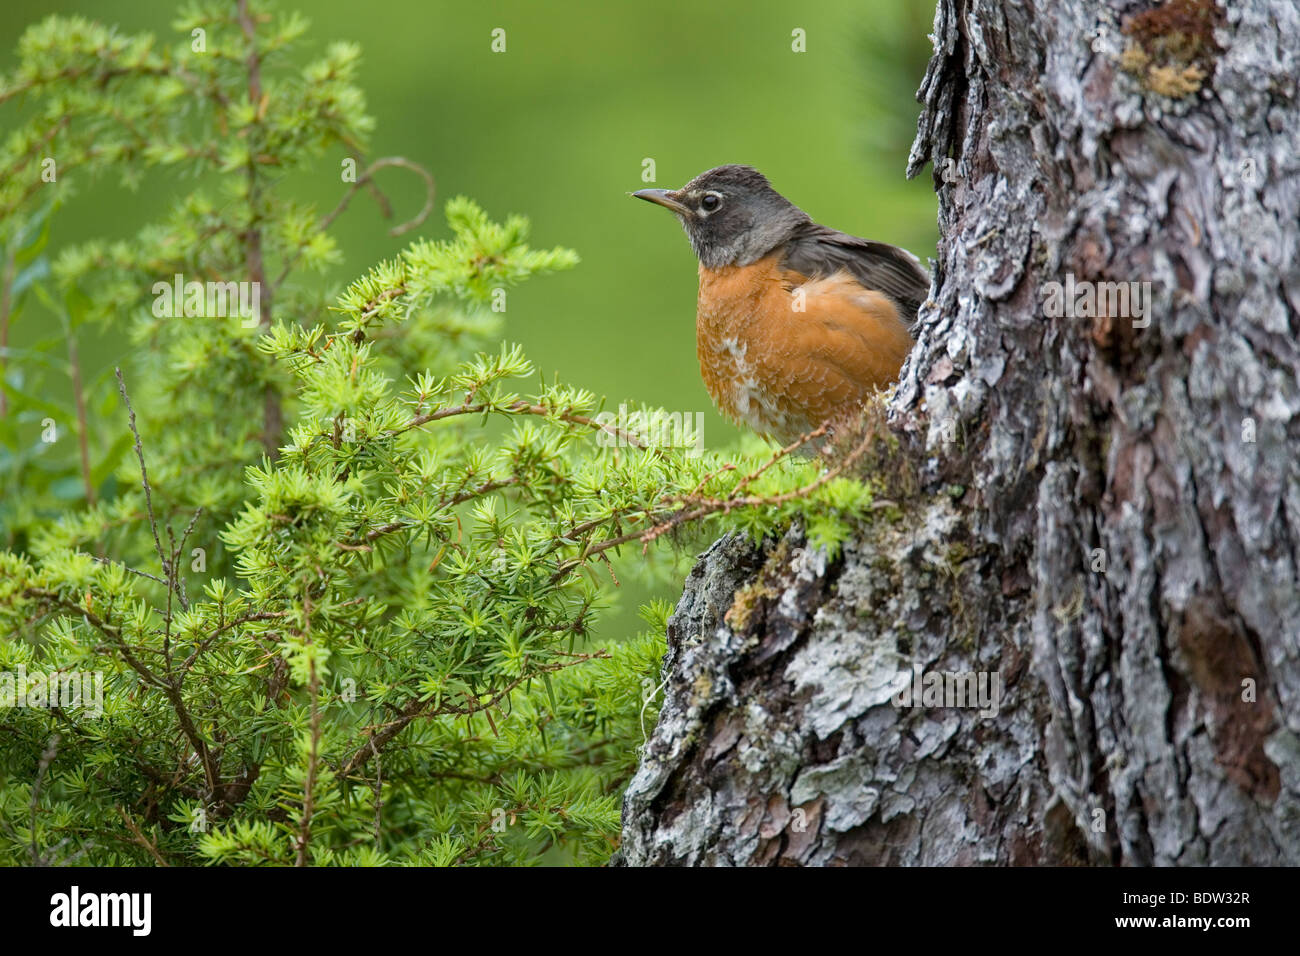 Wanderdrossel, American Robin (Turdus migratorius) - Stock Image